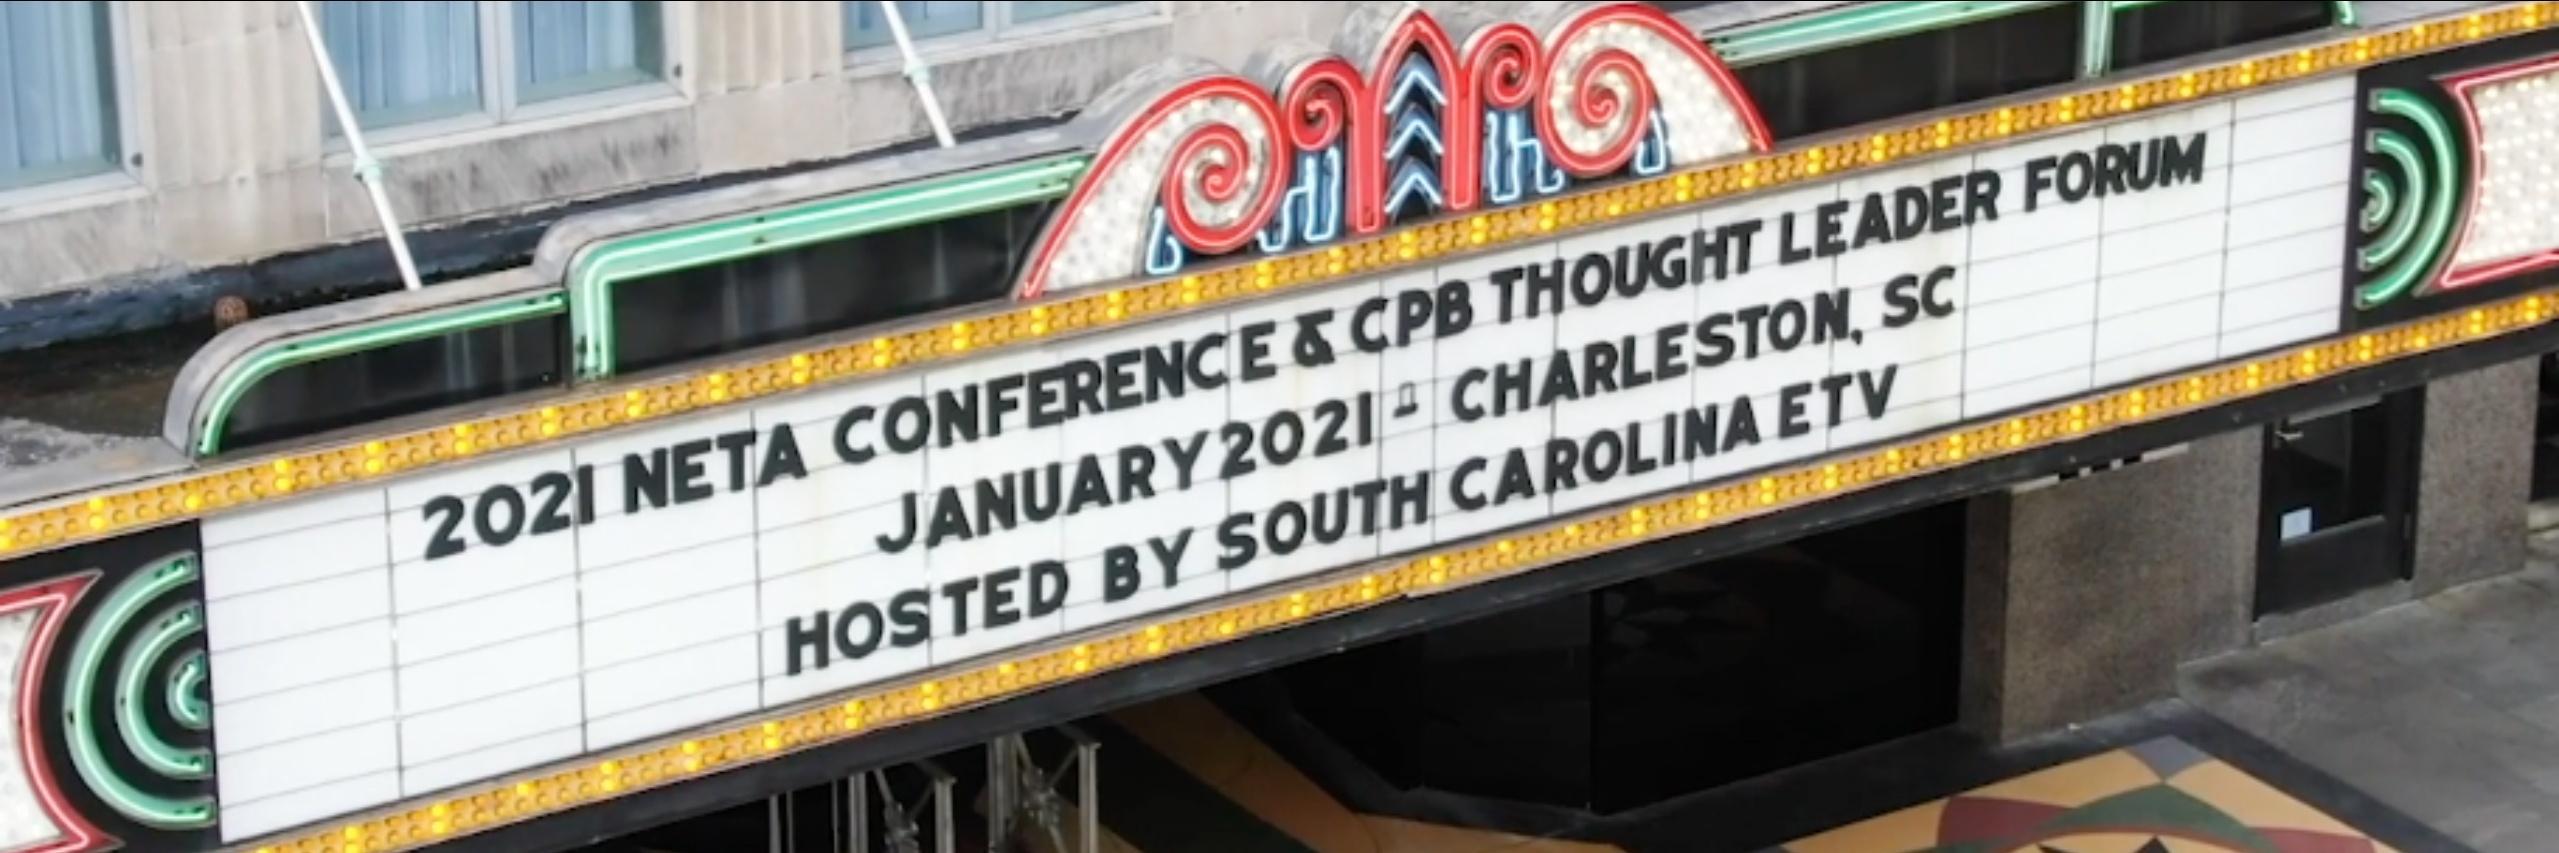 2021 NETA Conference Location